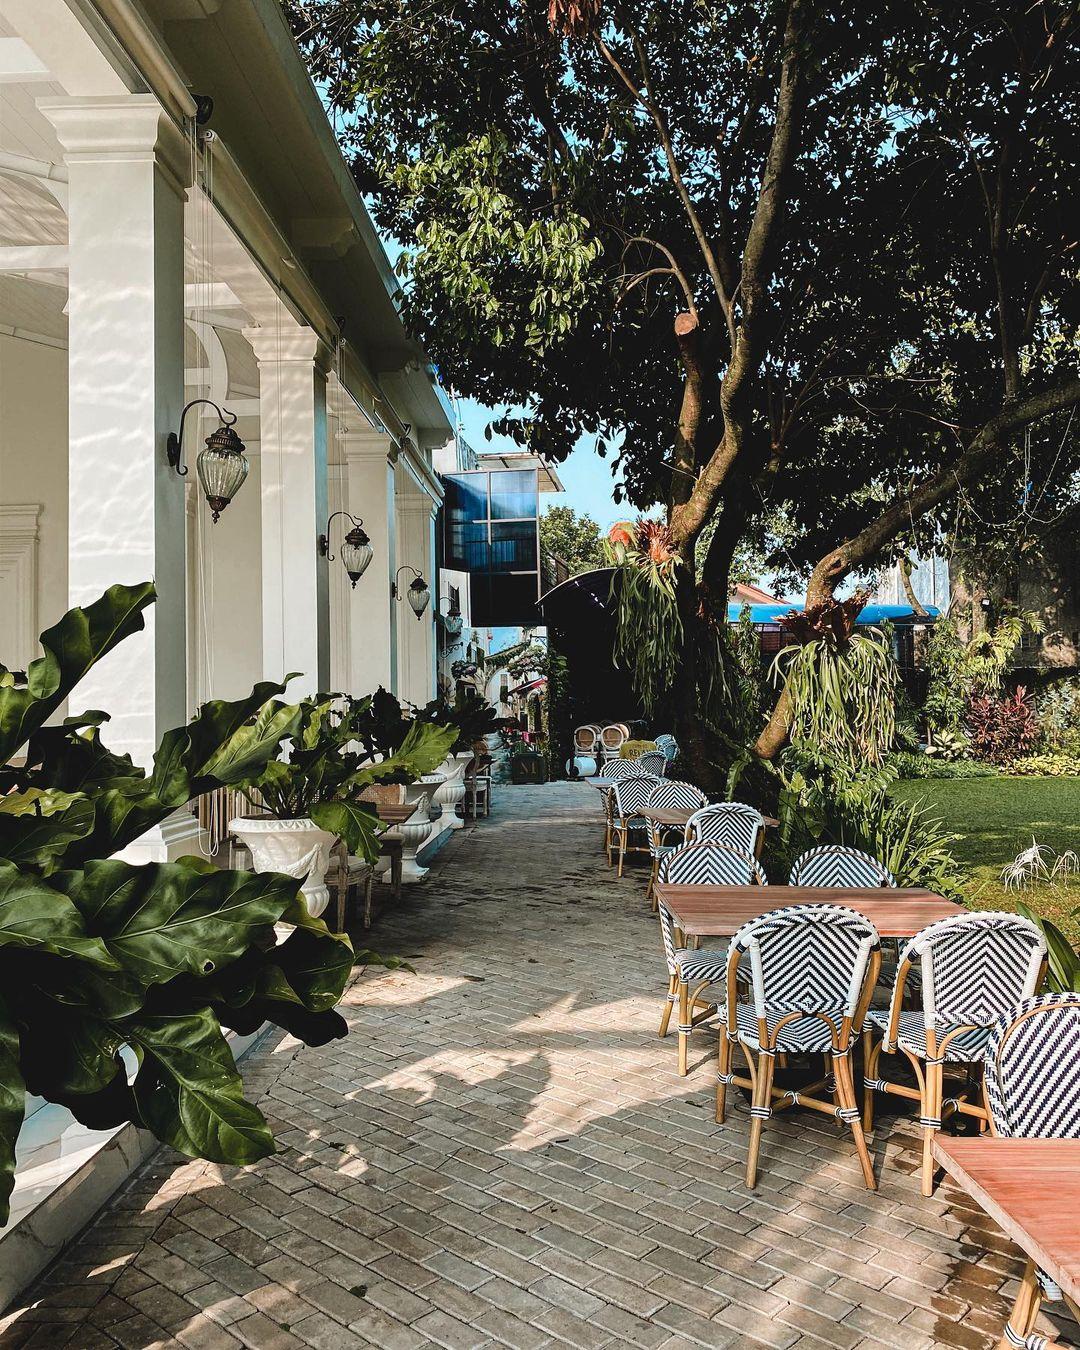 Suasana Rindang Di The Manor Cafe Image From @nandarasman